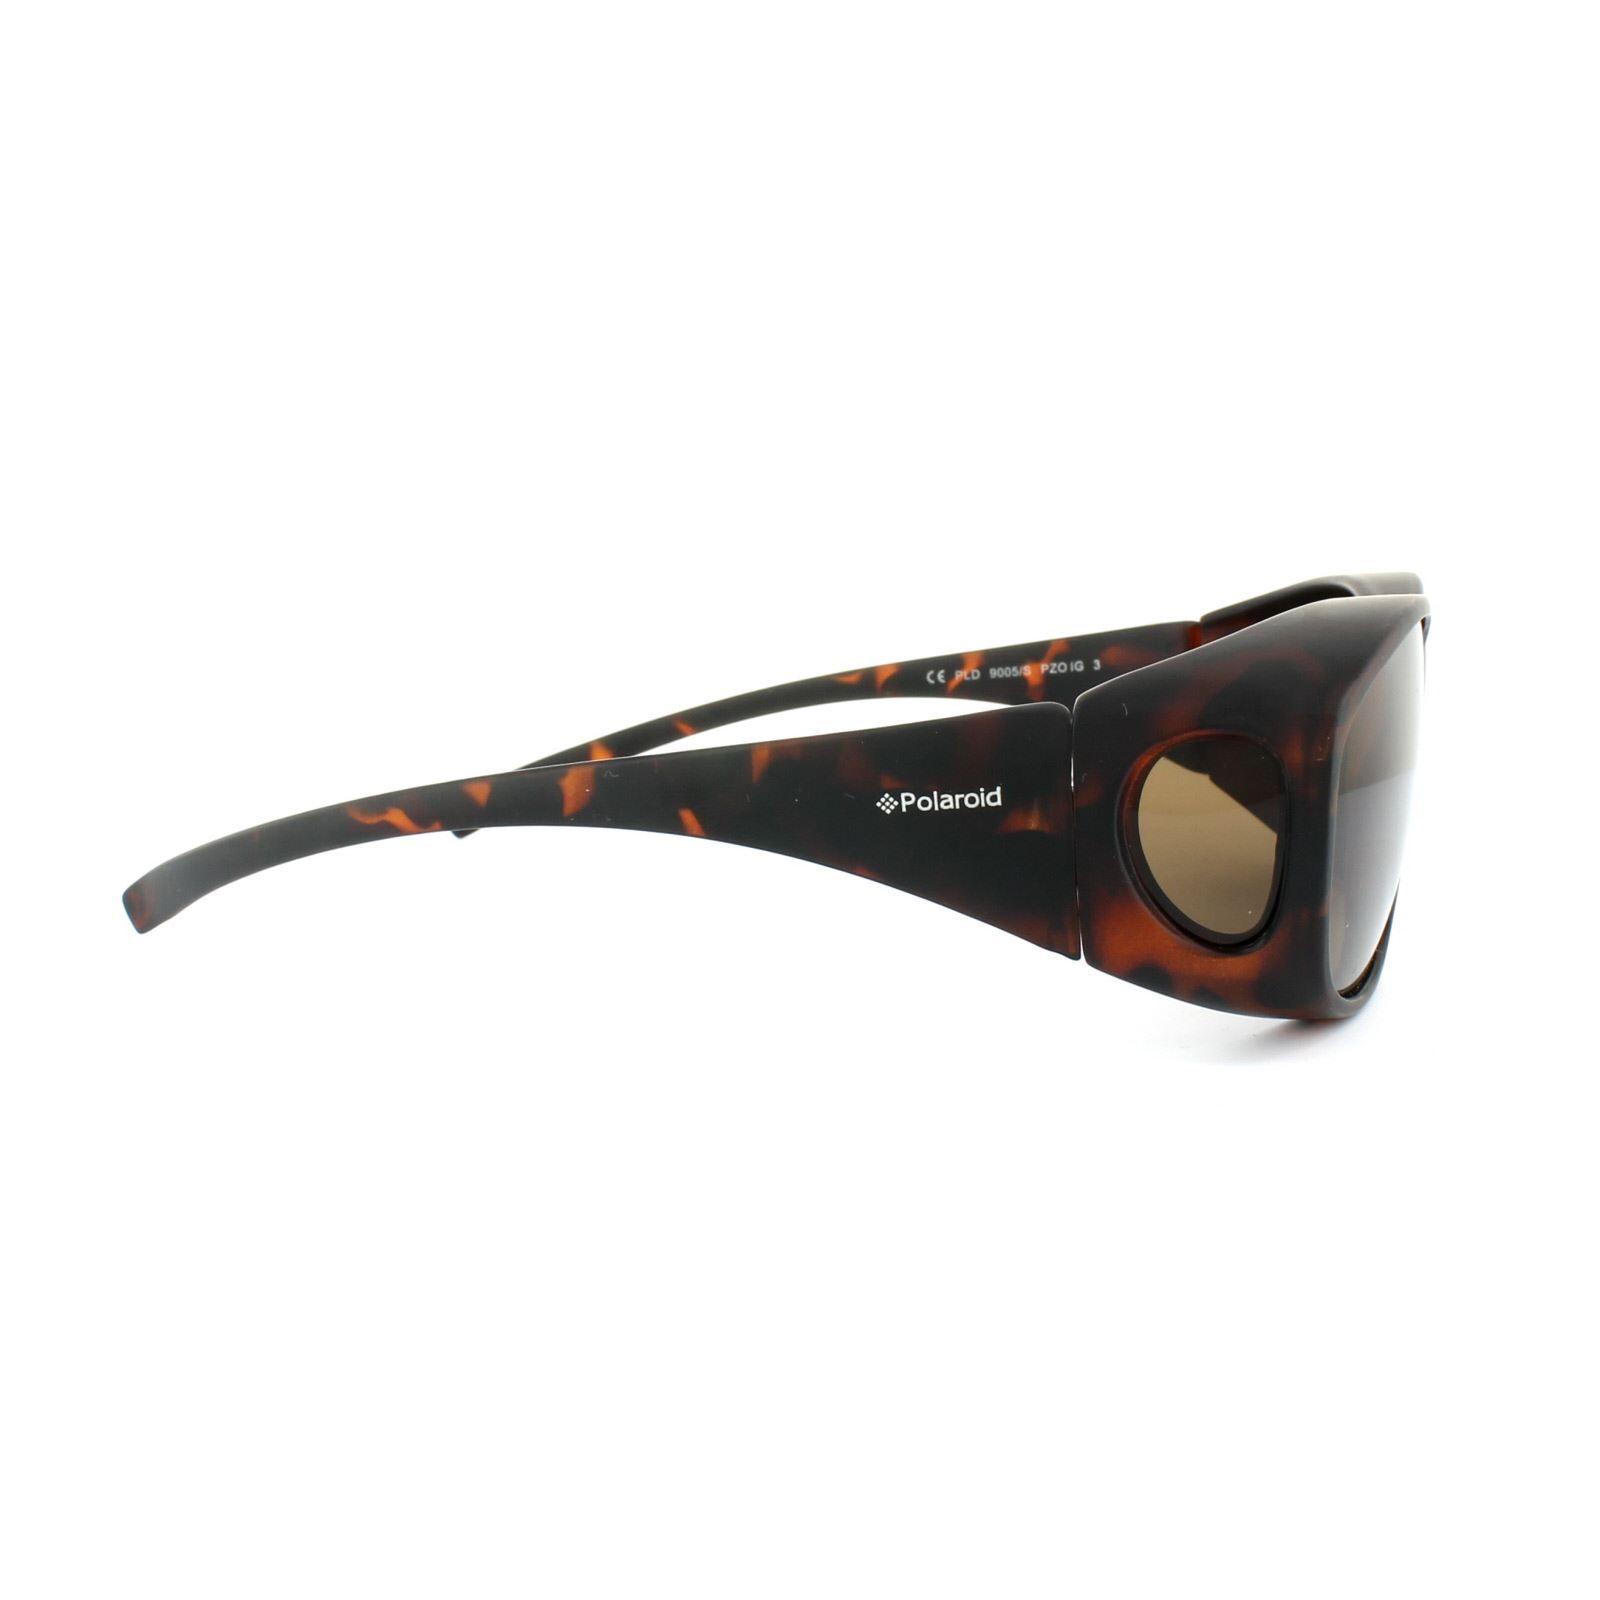 Polaroid Suncovers Fitover Sunglasses 9005/S PZO IG Matte Dark Havana Brown Polarized